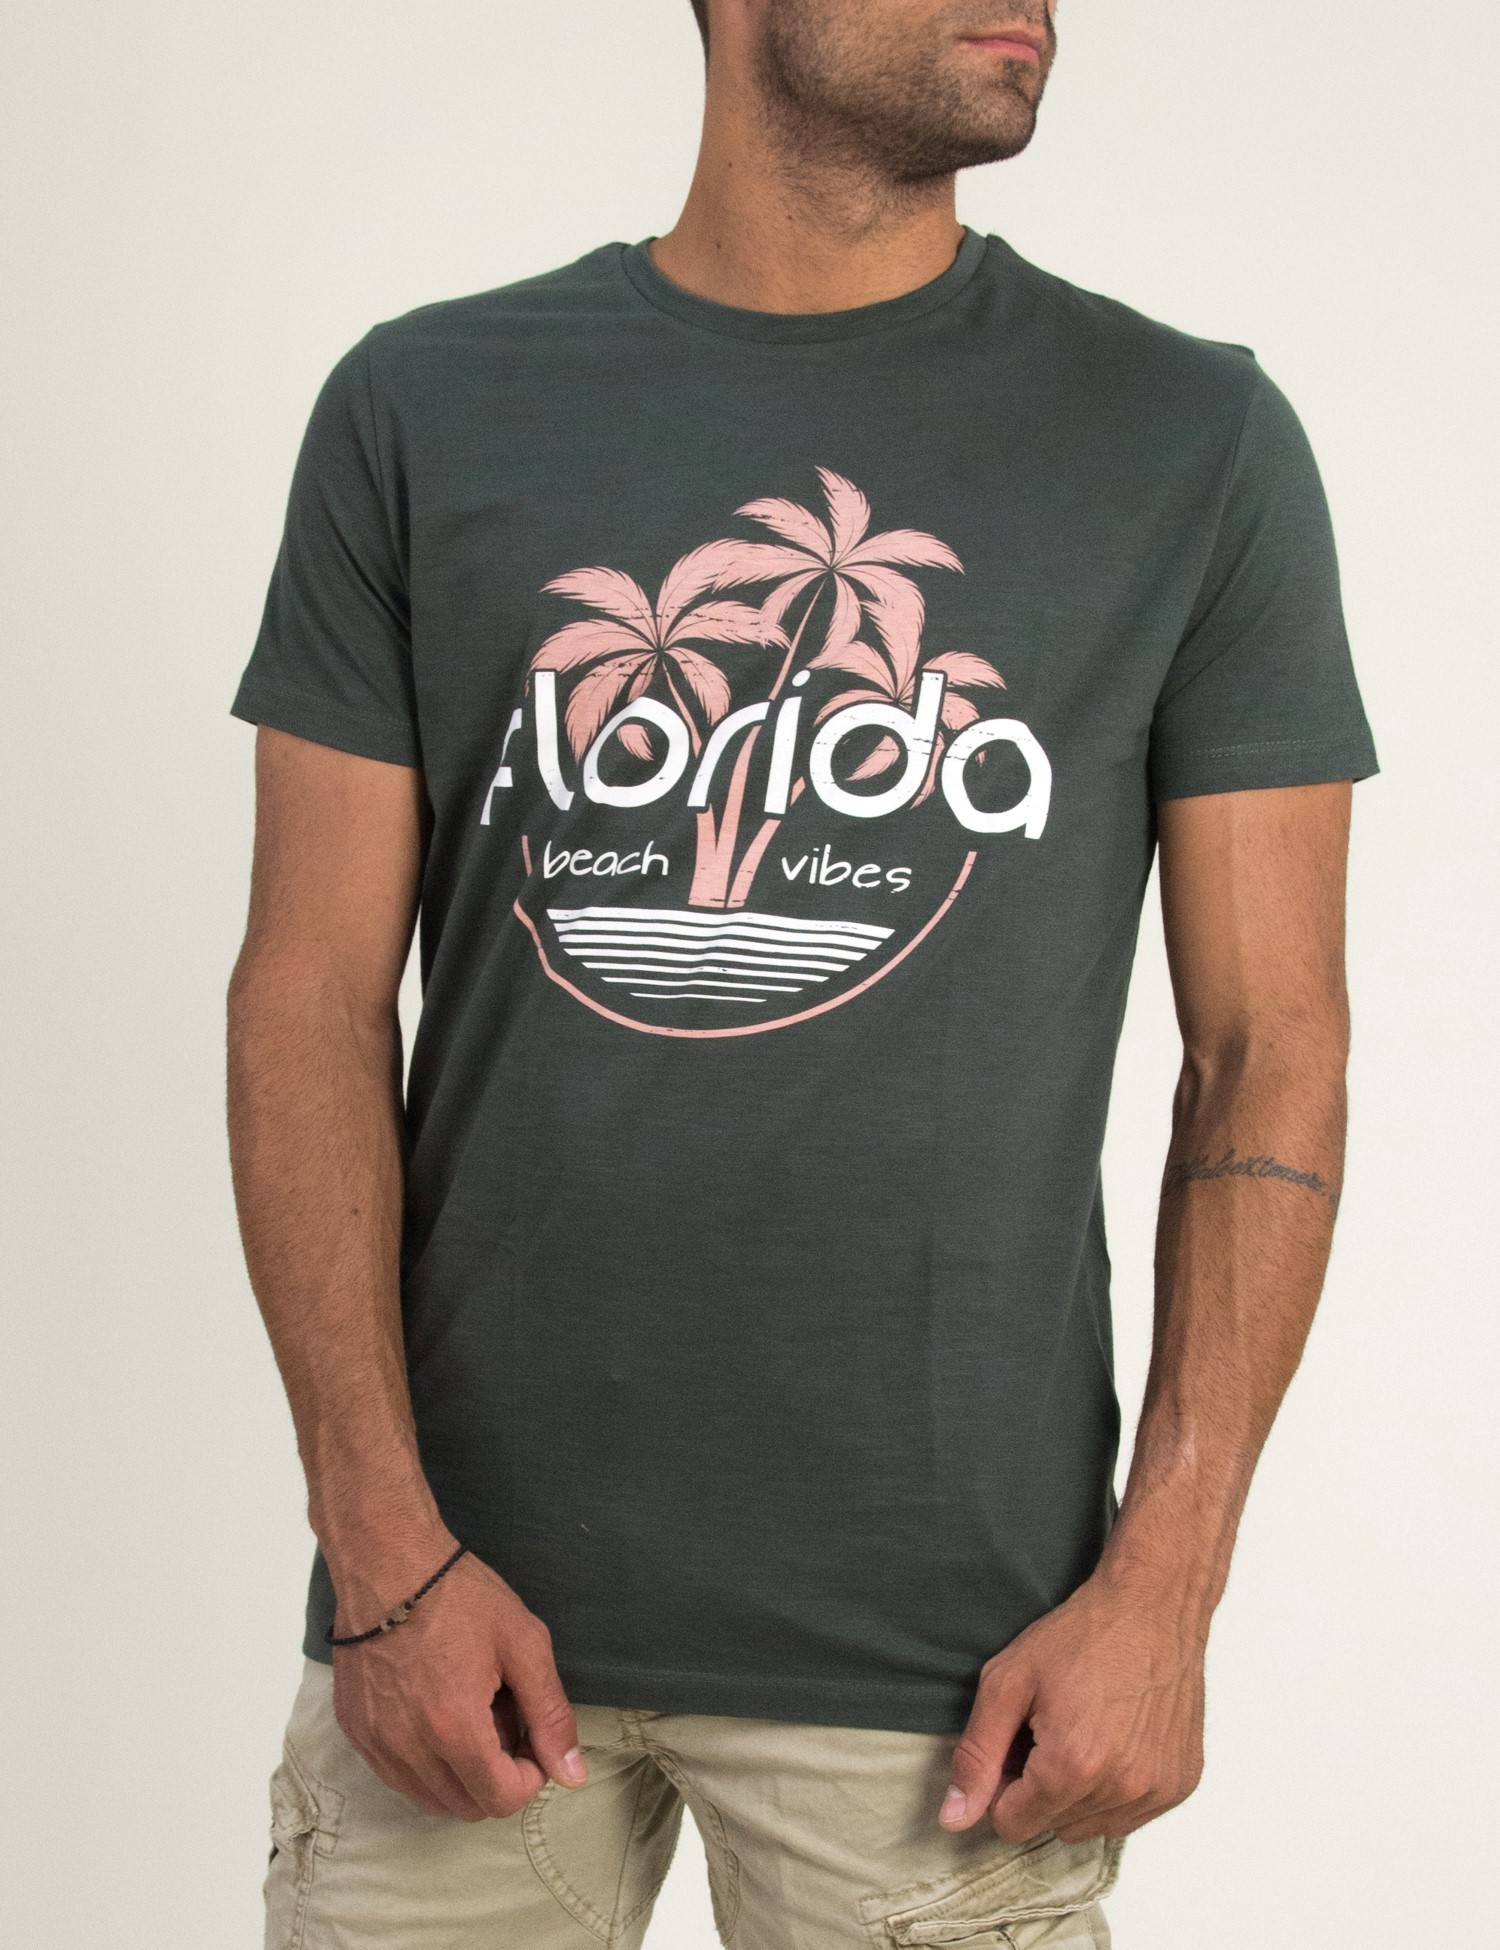 4266c88b19fd Ανδρική κοντομάνικη μπλούζα με τύπωμα Brothers χακί 5041F